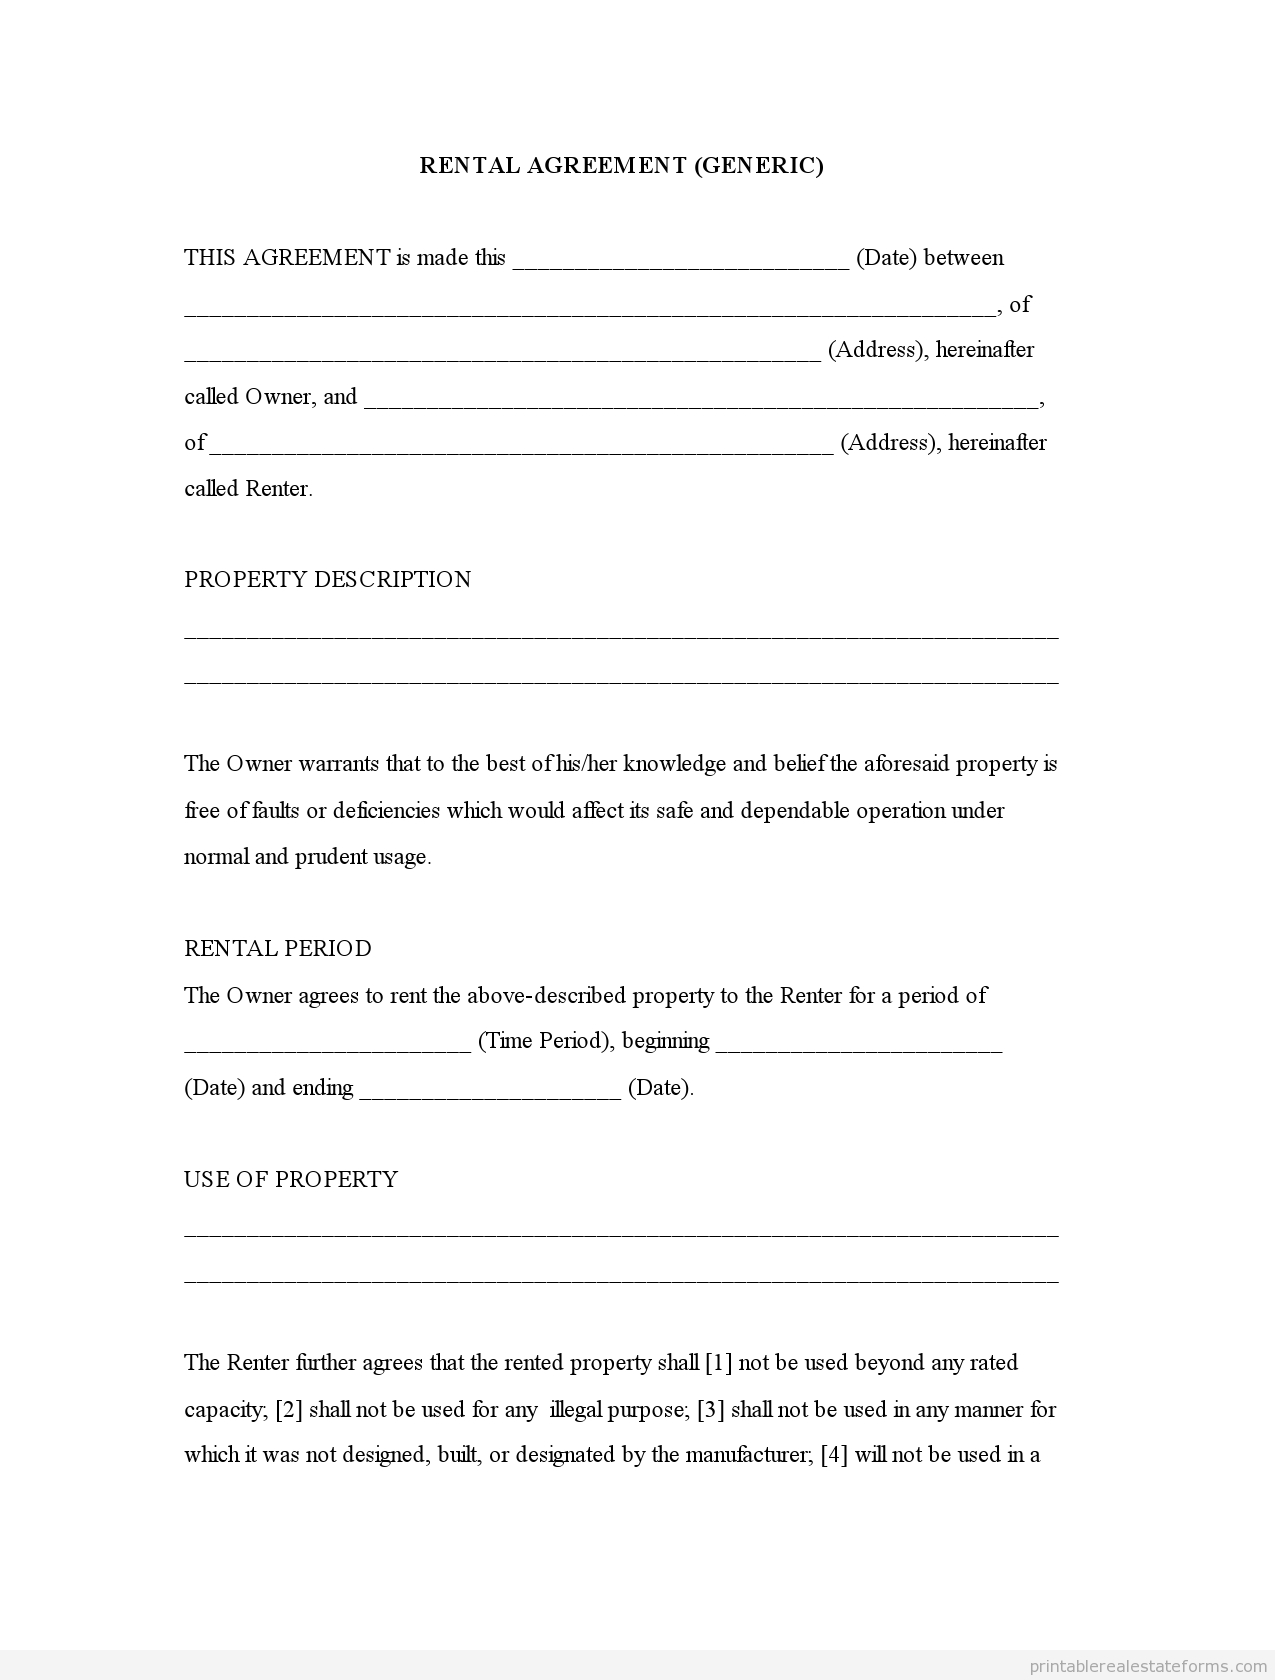 Free Printable Rental Agreement   Rental Agreement (Generic)0001 - Free Printable Lease Agreement Forms